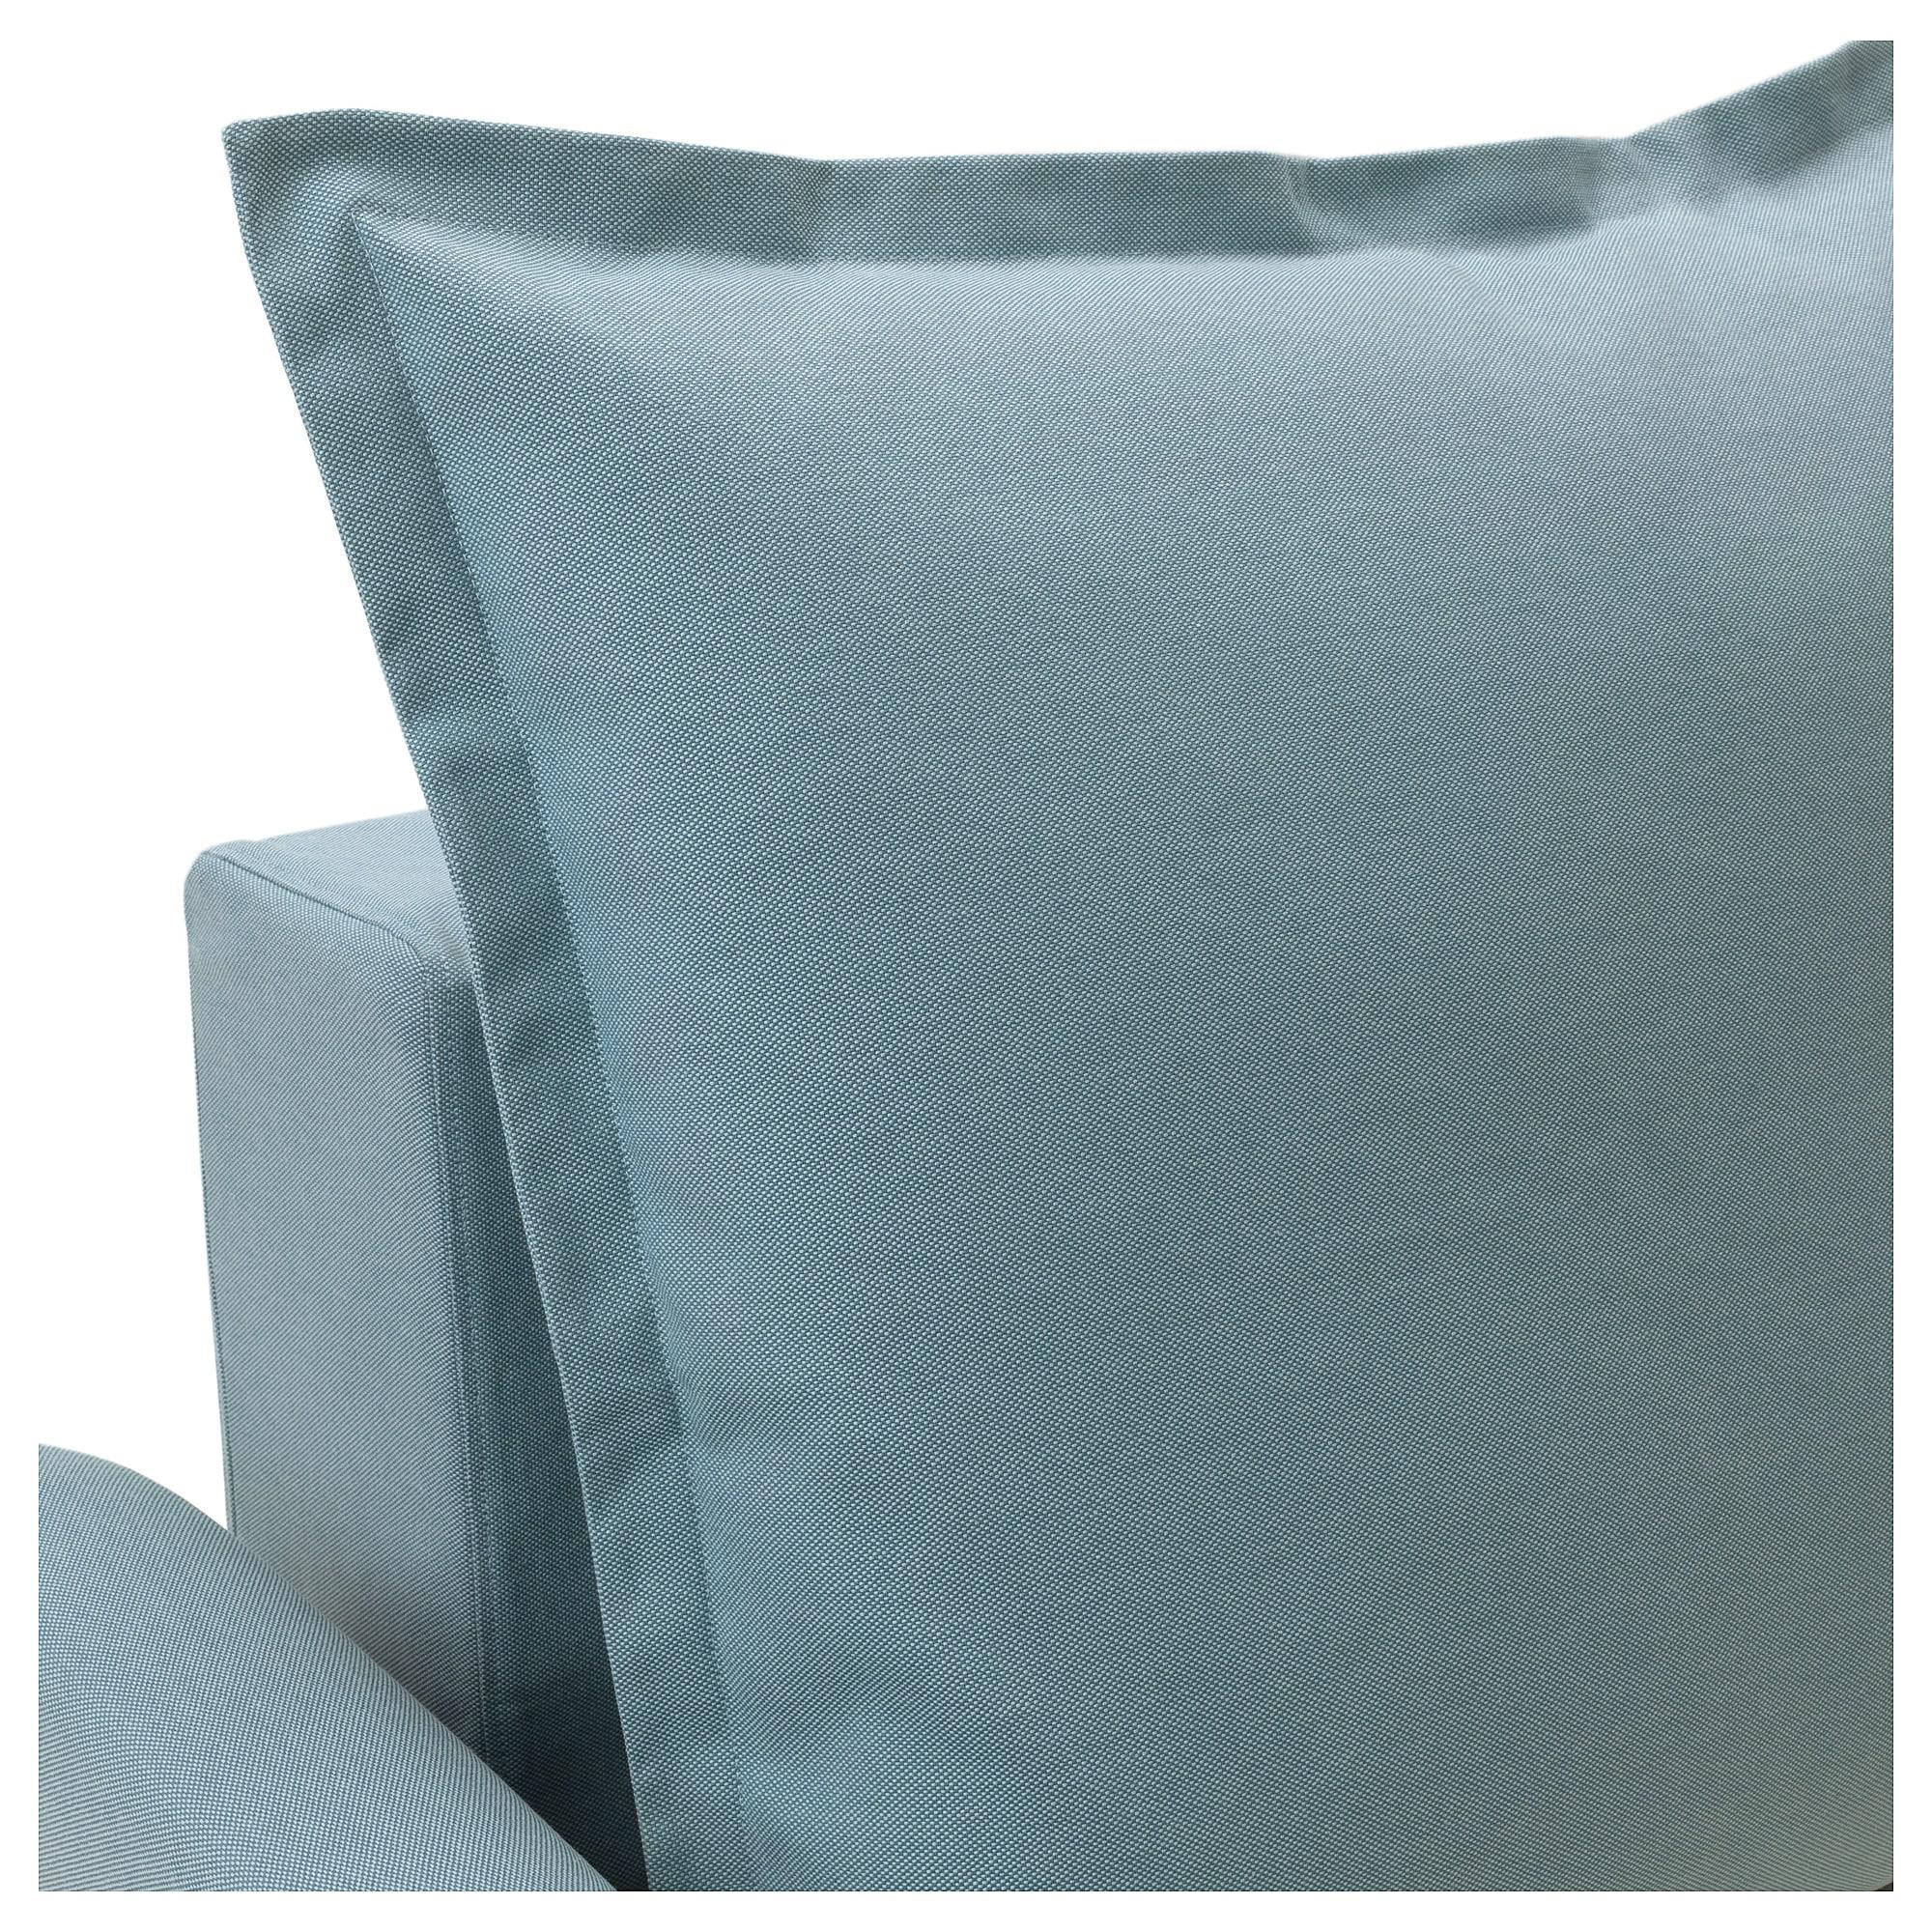 Ikea Canapés Convertibles Meilleur De Collection Holmsund Convertible 3 Places orrsta Bleu Clair Ikea